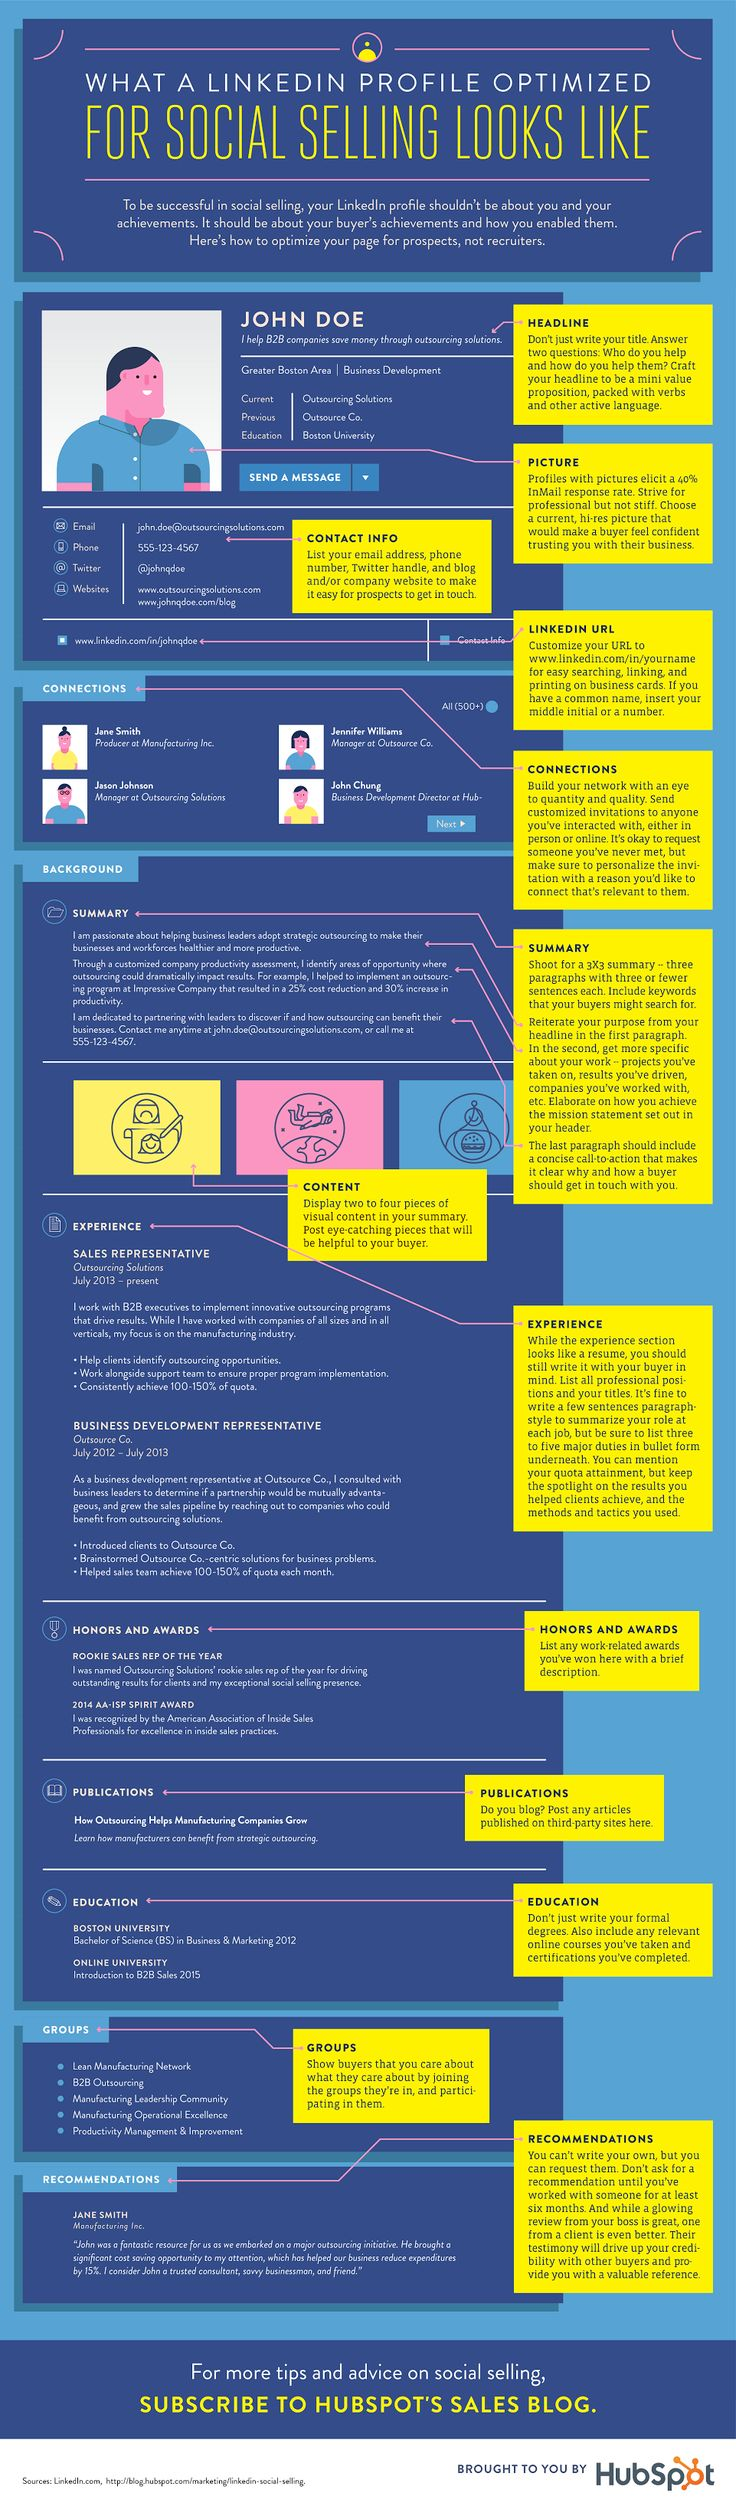 What A LinkedIn Profile Optimized For Social Selling Looks Like - #infographic #socialmediamarketing #InfographicsSocialMedia